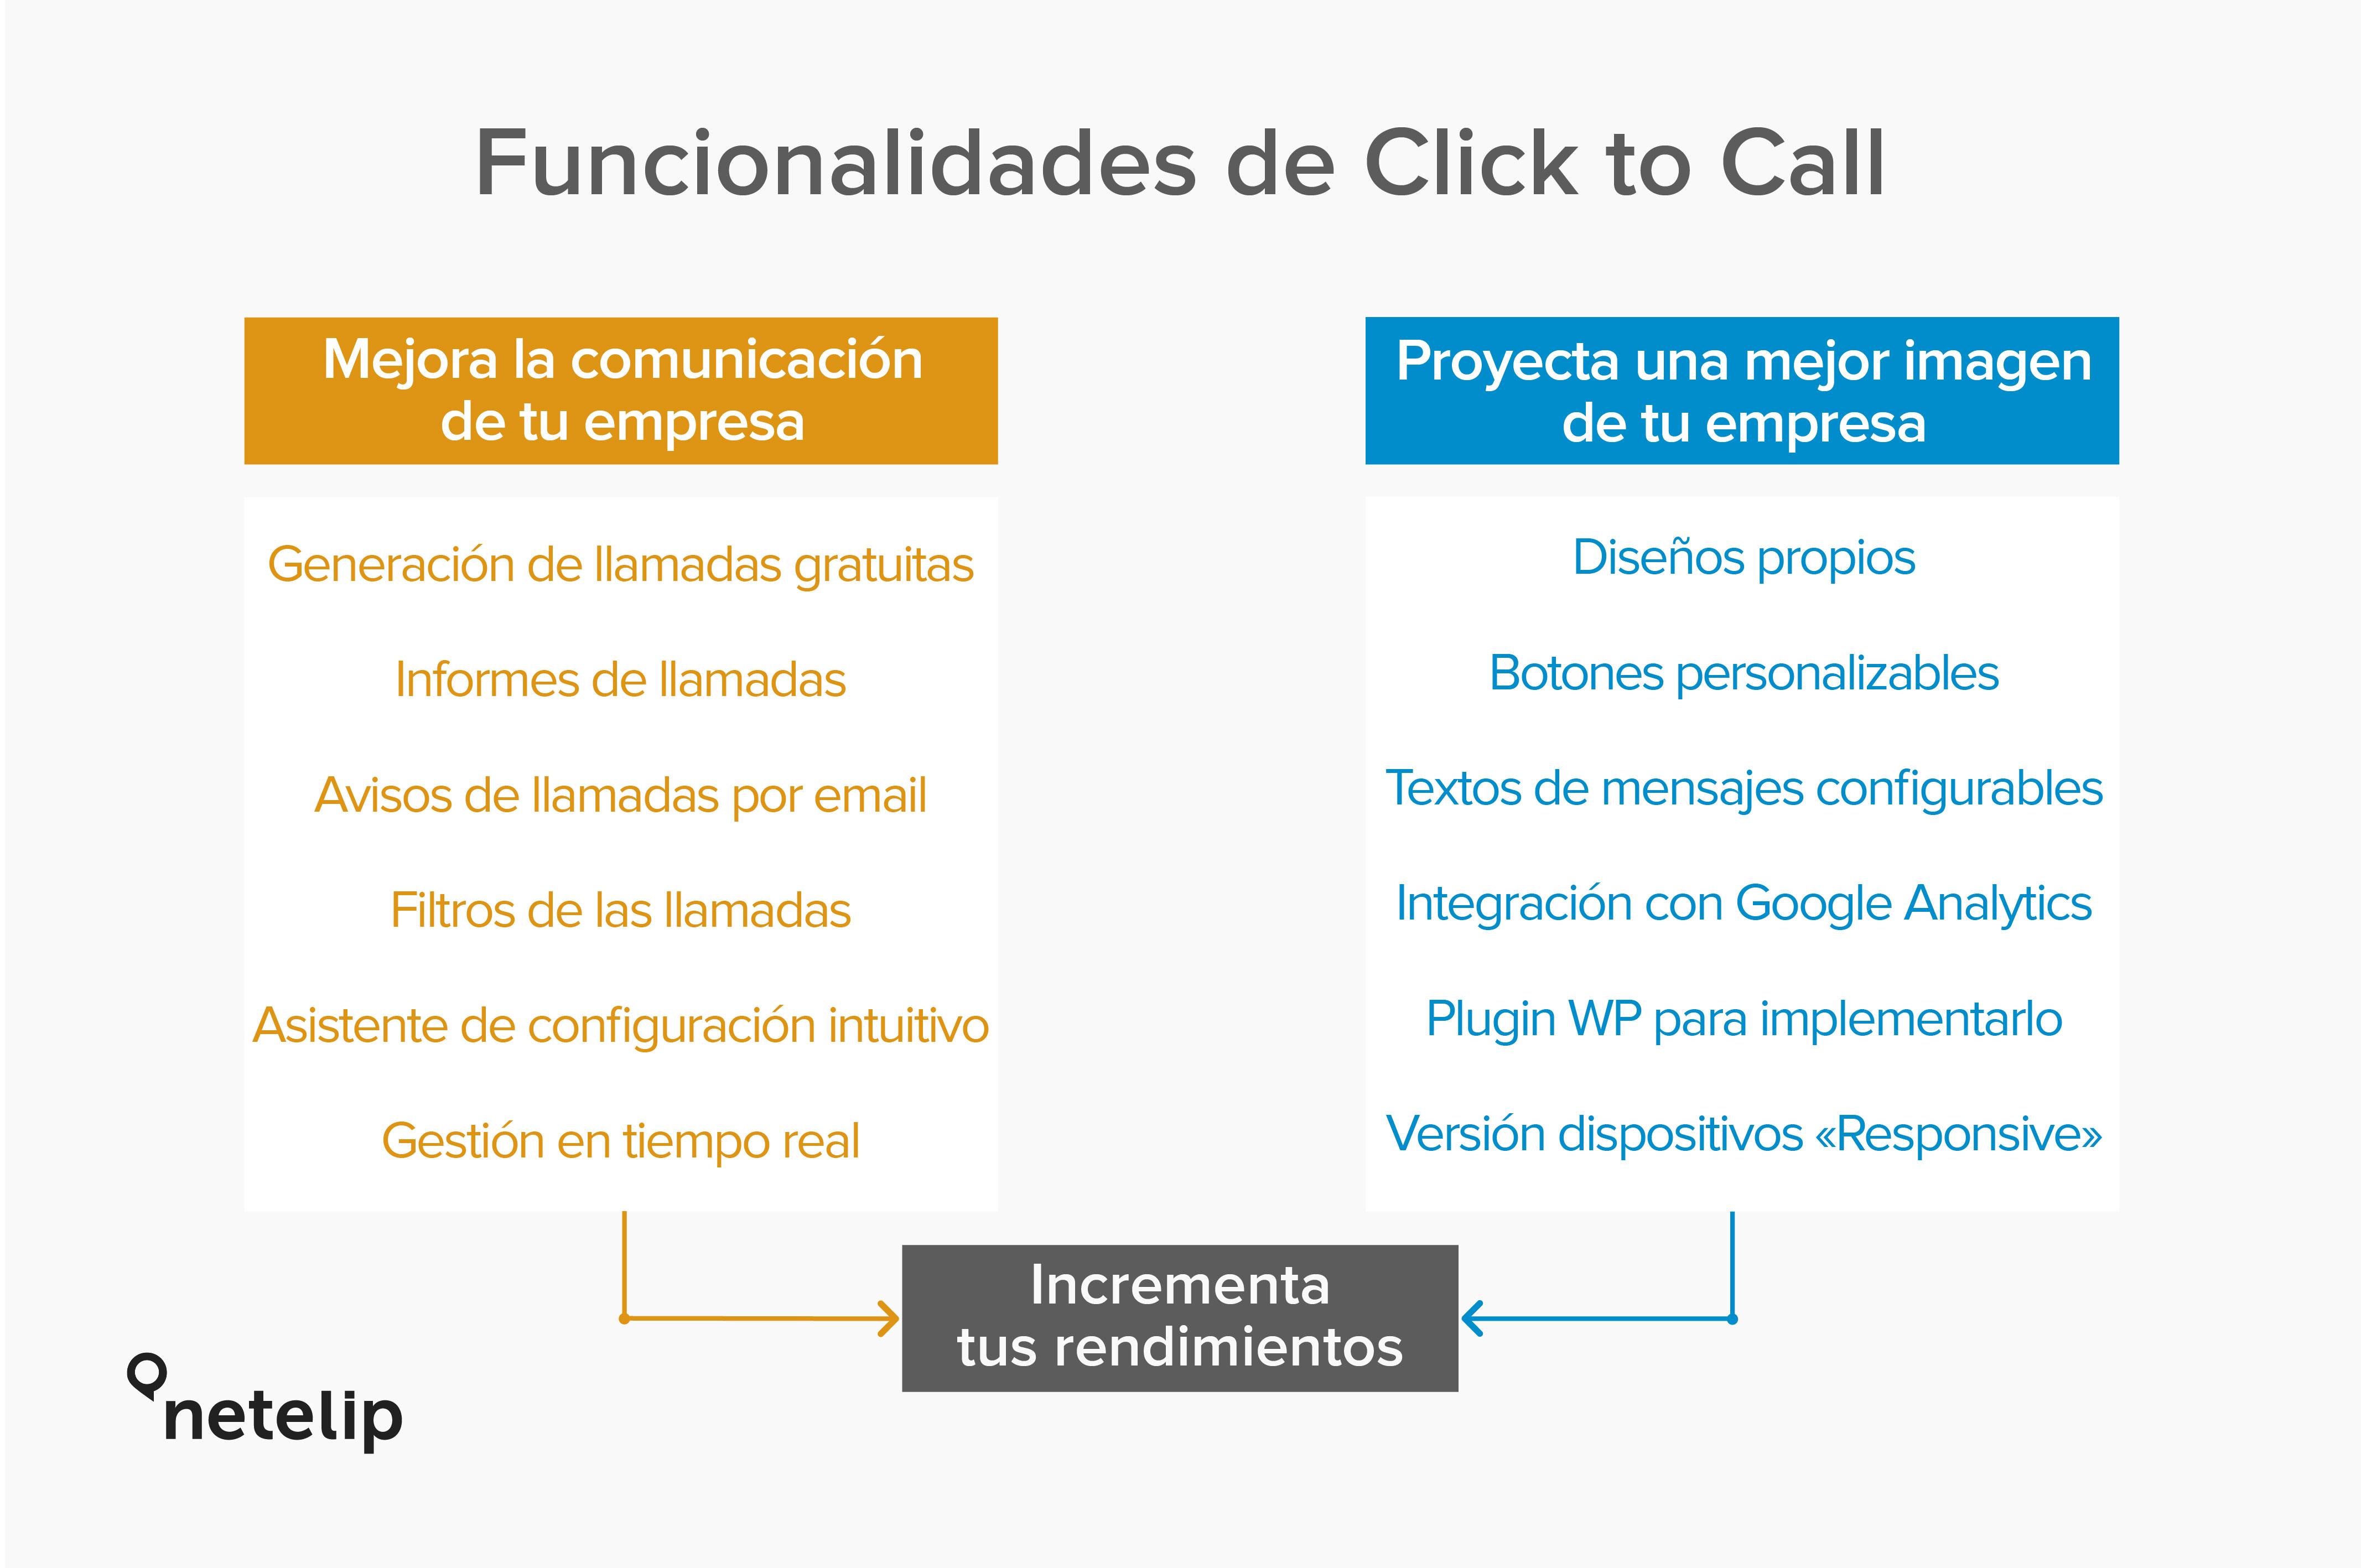 Click to Call dispone de muchas funcionalidades